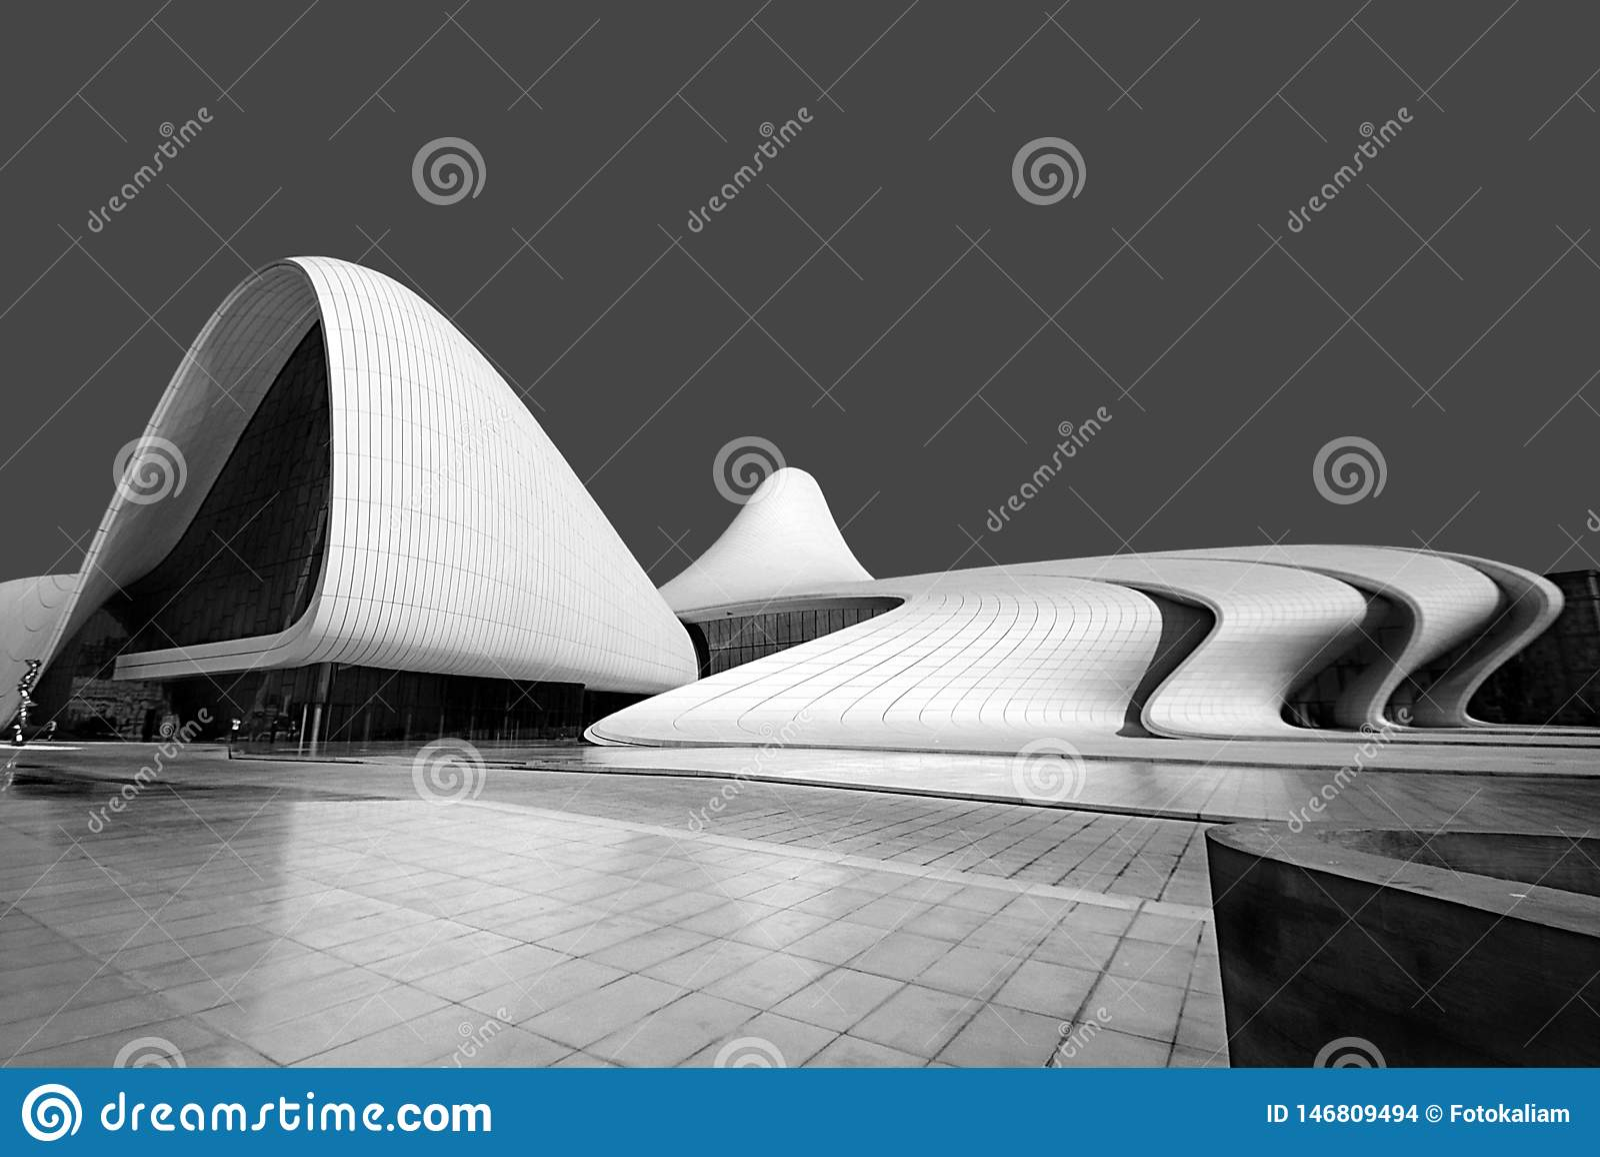 Baku, Azerbaijan, Cultural Center named after Heydar Aliyev